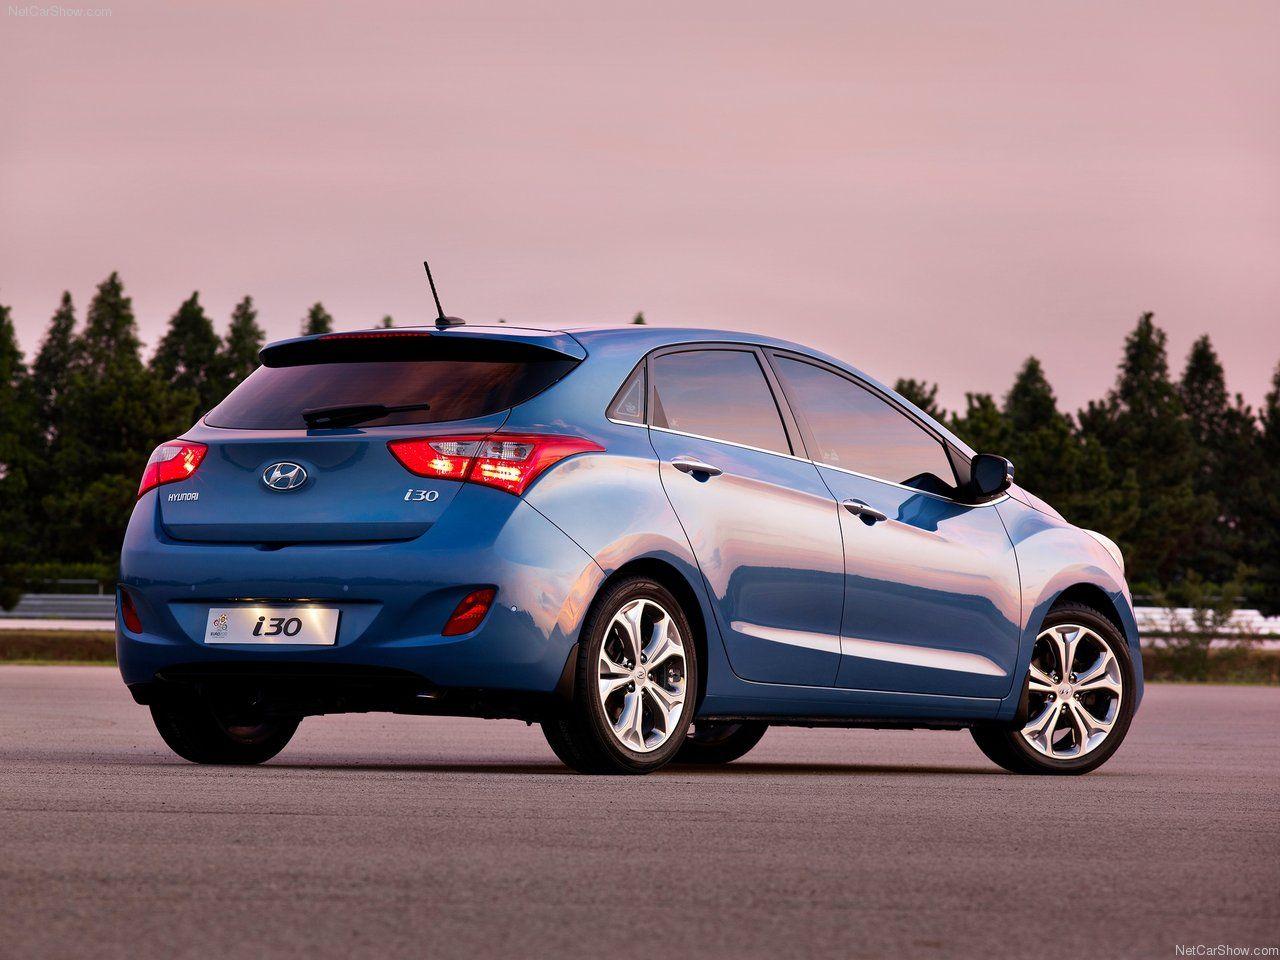 25 Red Mccombs Superior Hyundai Ideas Hyundai Hyundai Cars New Hyundai